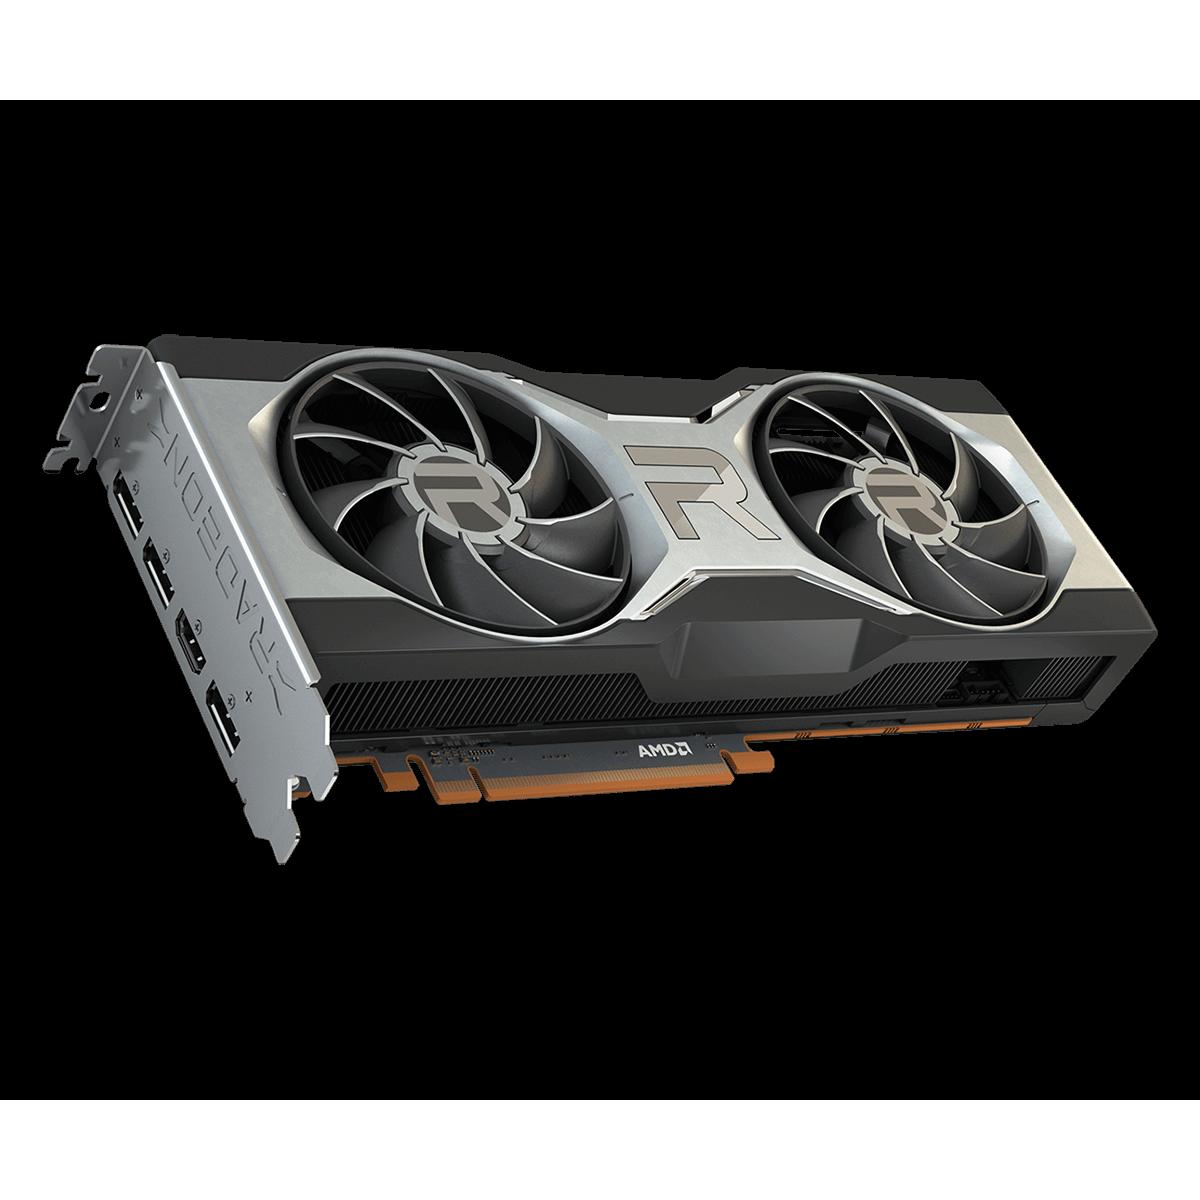 Placa de Vídeo ASRock Radeon RX 6700 XT, 12GB, GDDR6, 192bit, 90-GA2WZZ-00UANF